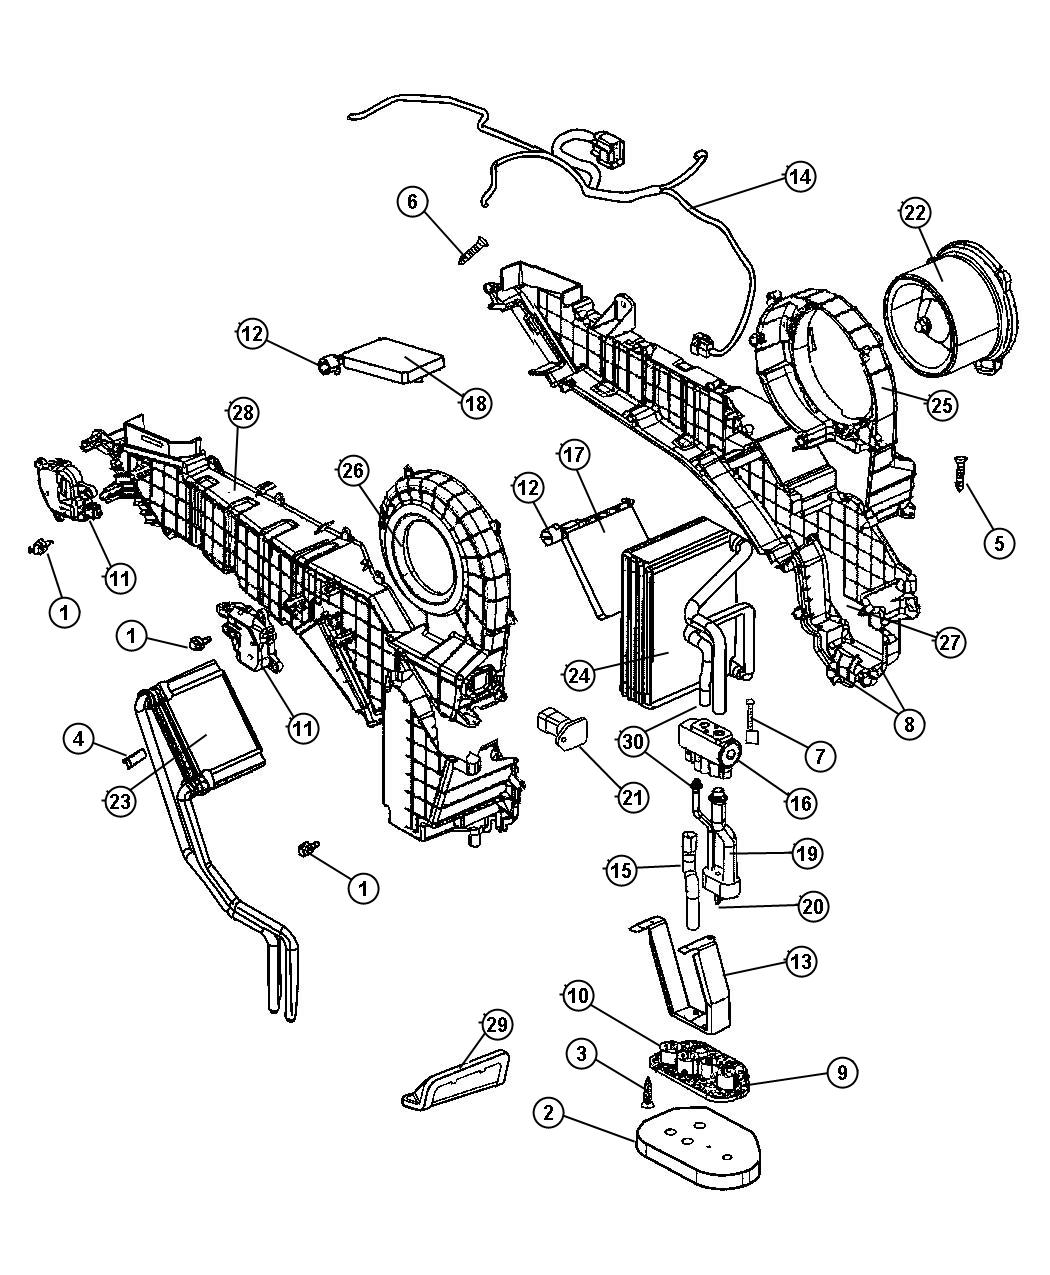 wiring diagrams for 2005 dodge durango